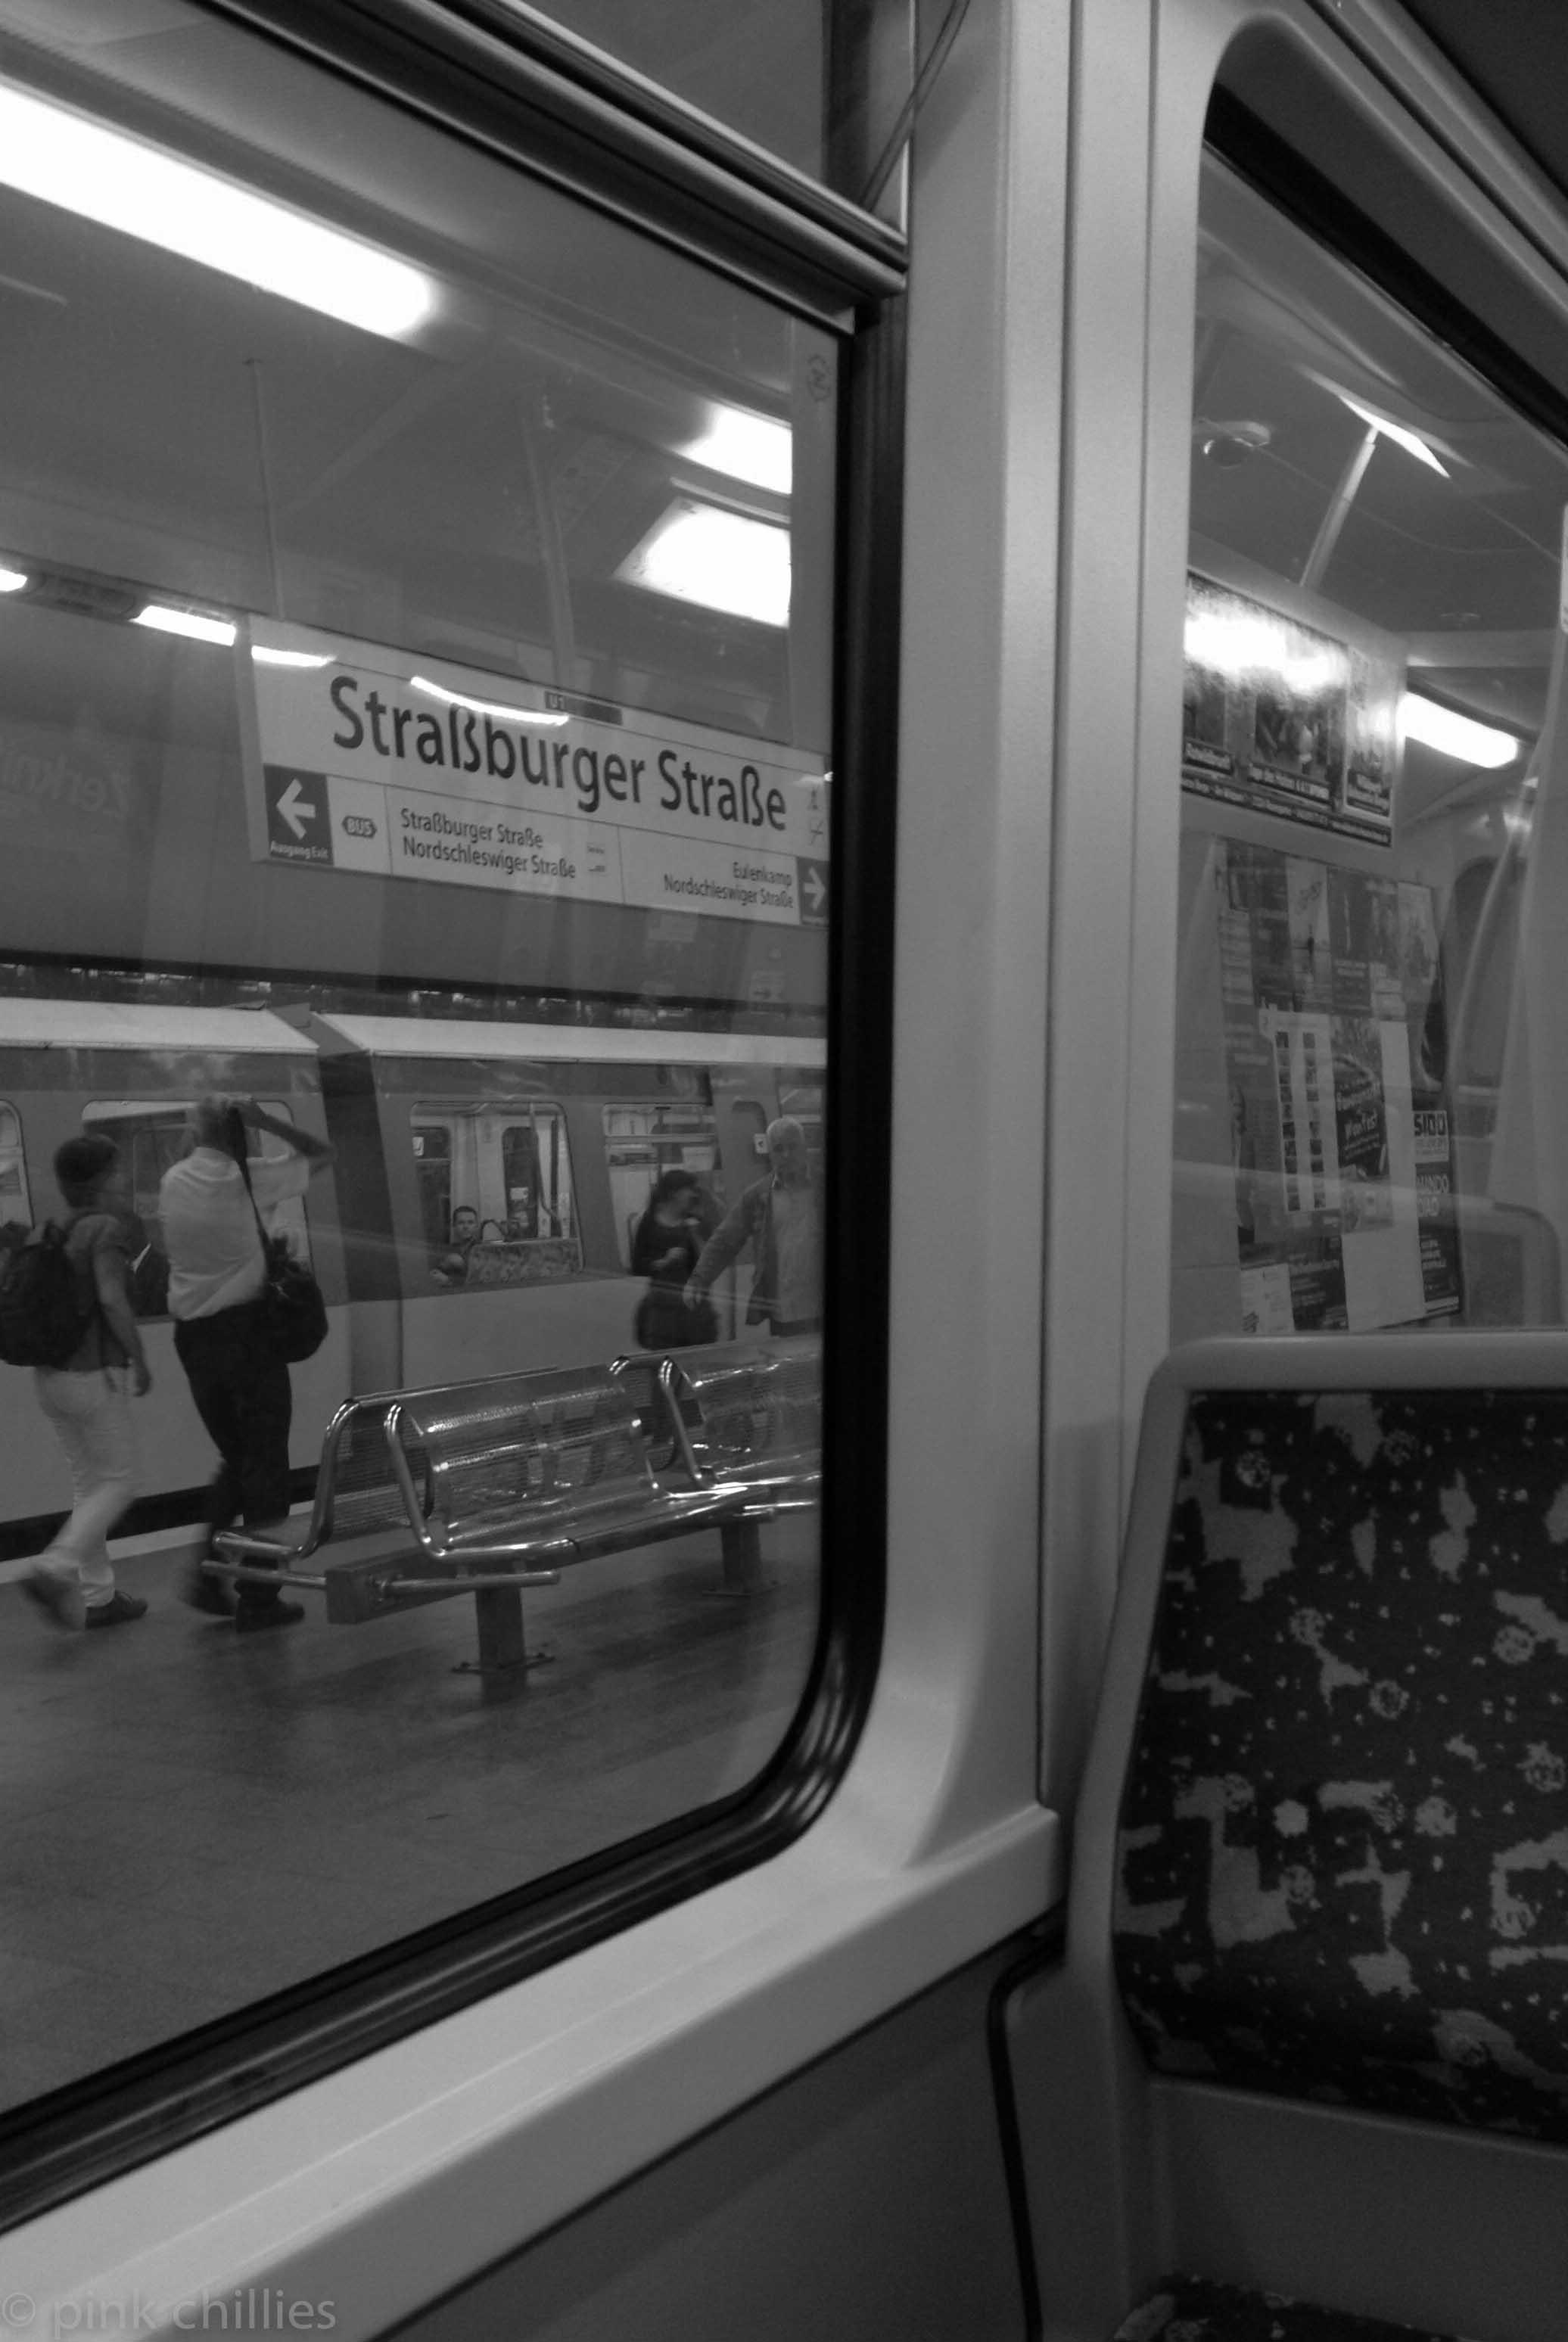 U Bahn Station Straßburger Straße